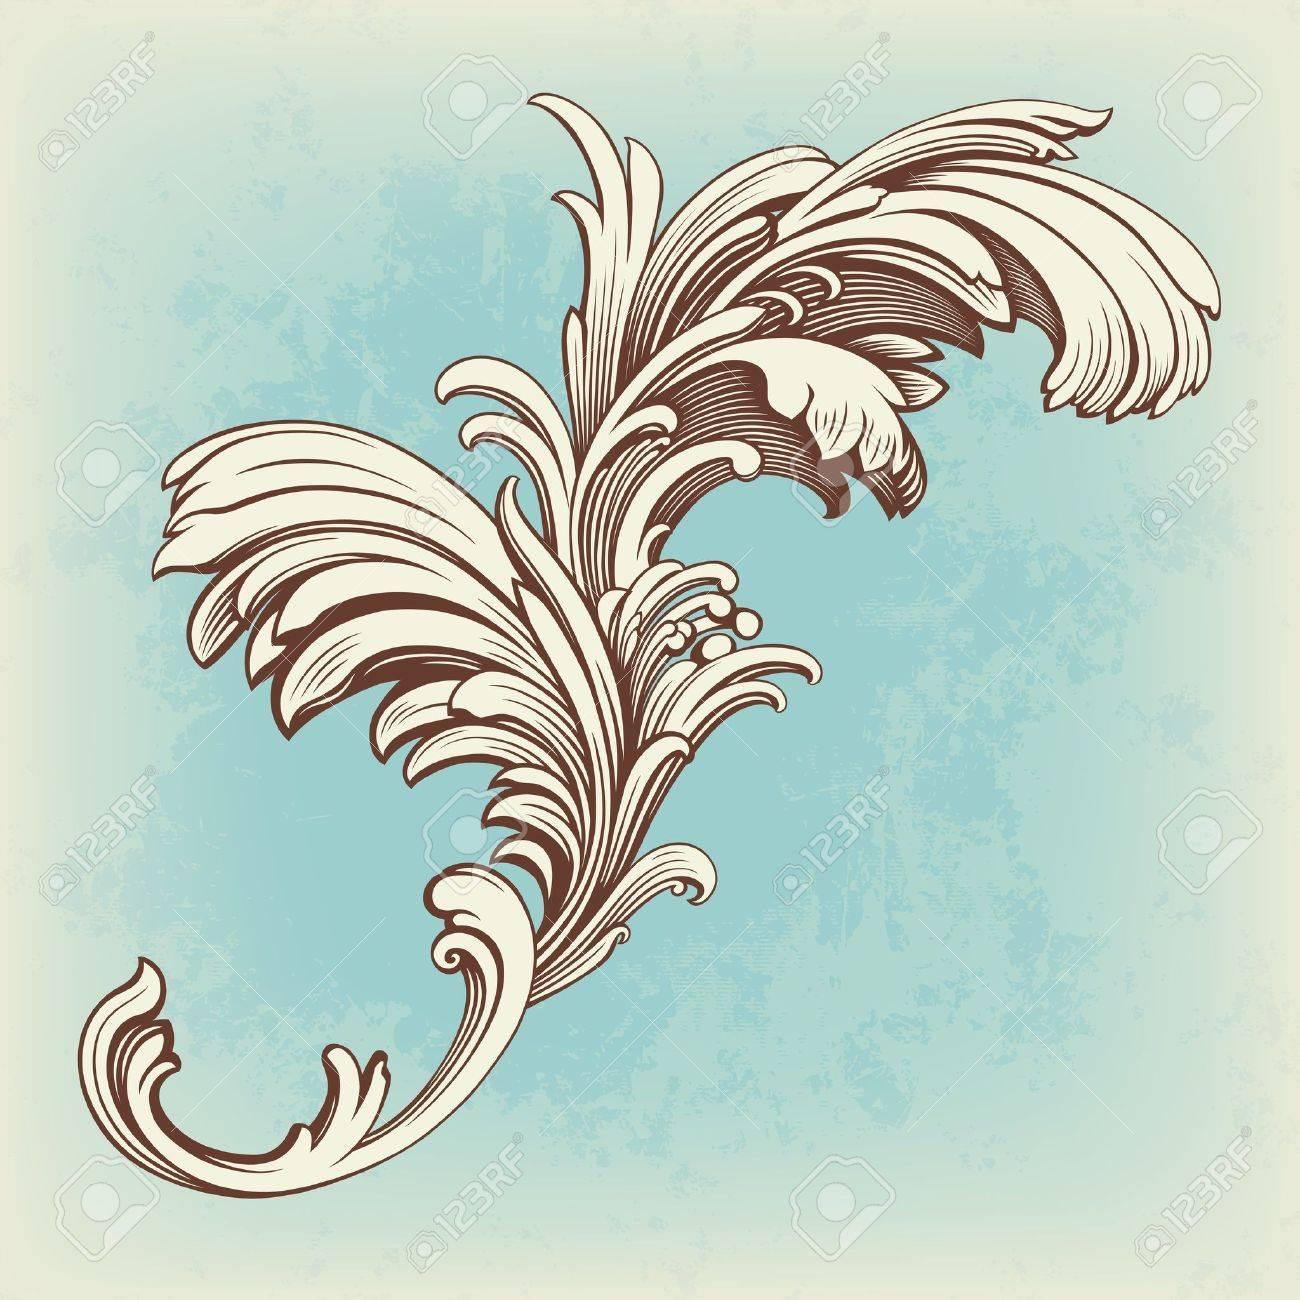 Scroll 1 Motif | JoAnn Hoffman | Digitized Quilting Designs